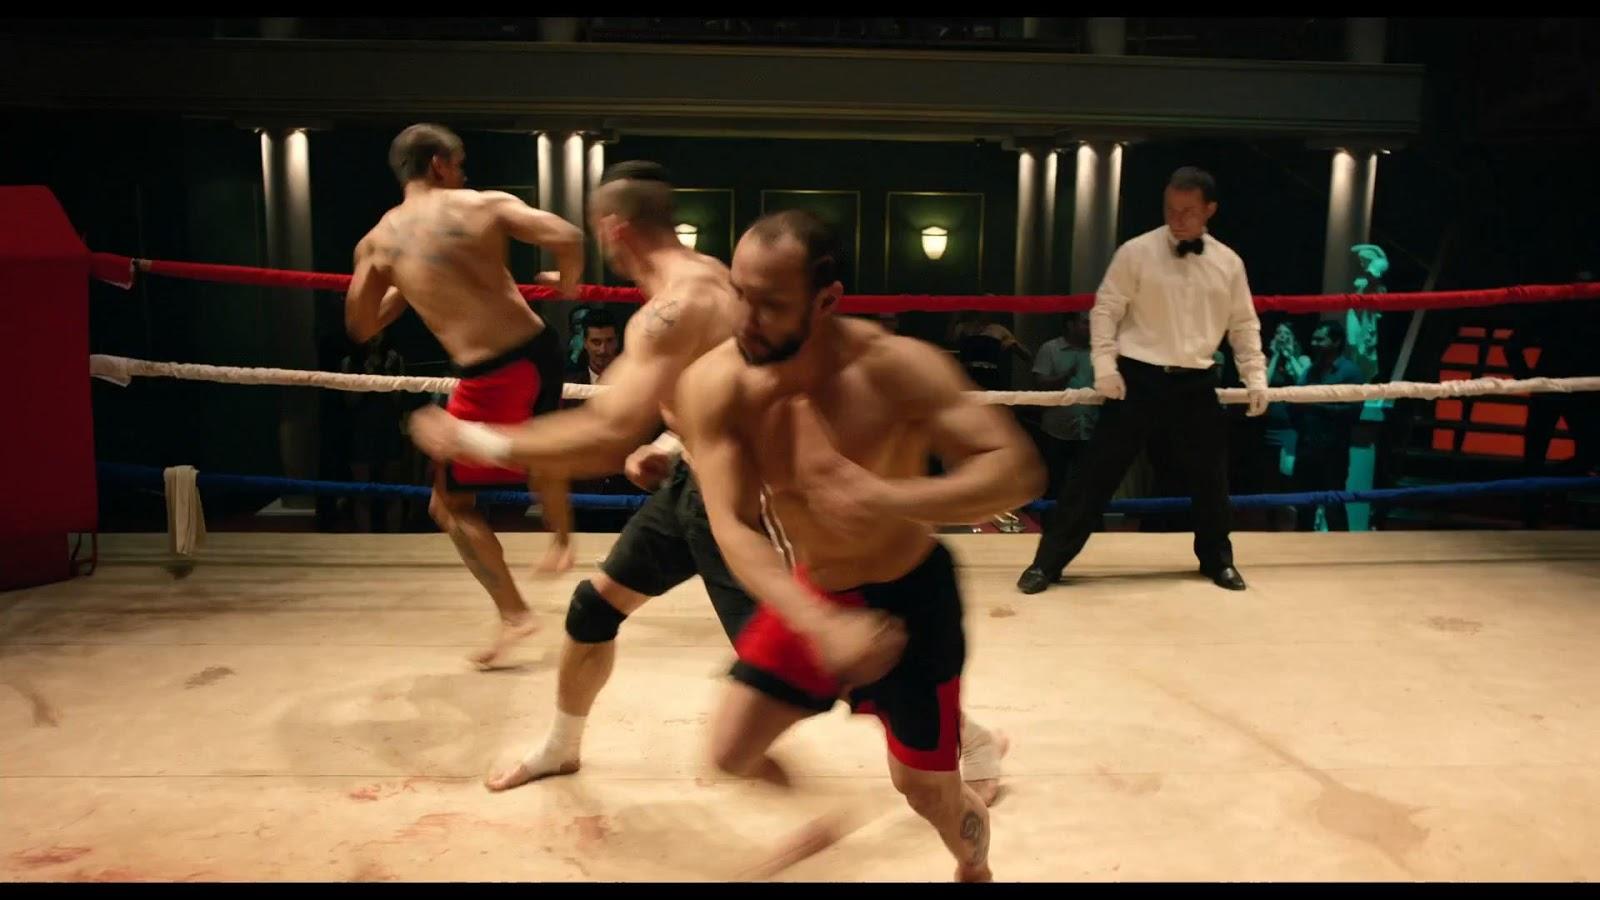 Boyka: Invicto 4 (2016) HD 1080p Español Latino – Ingles captura 3